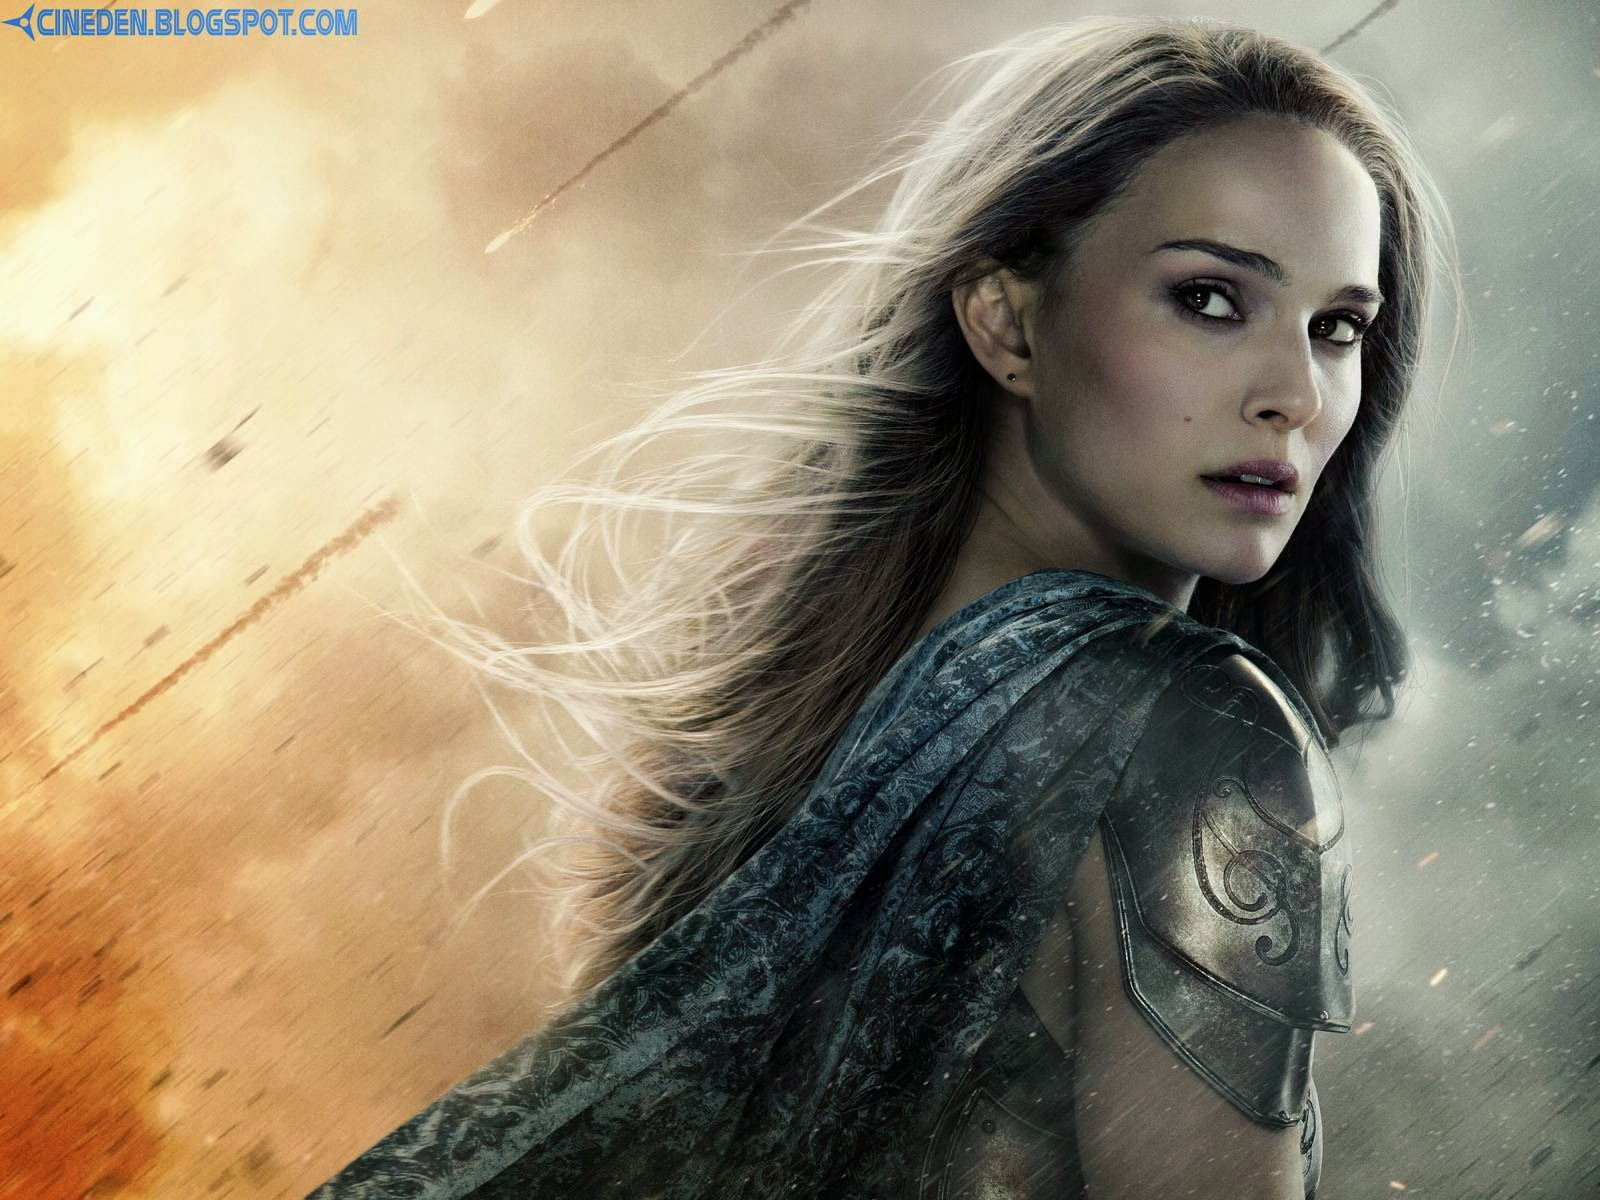 Natalie Portman gives son piggyback ride - CineDen